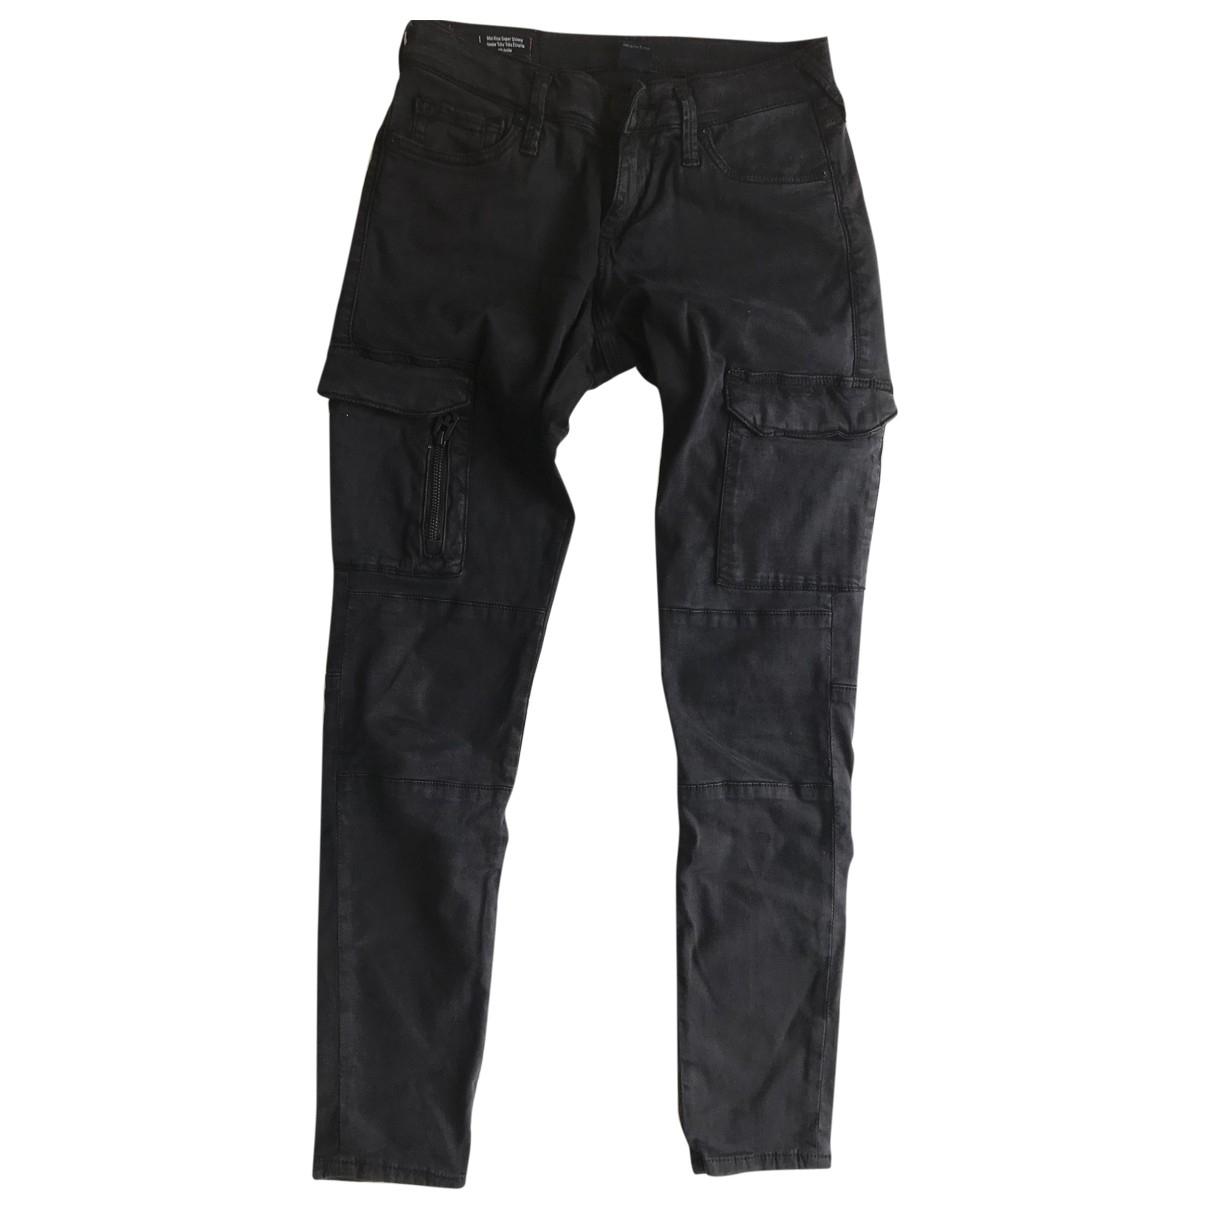 True Religion \N Black Cotton Trousers for Women S International